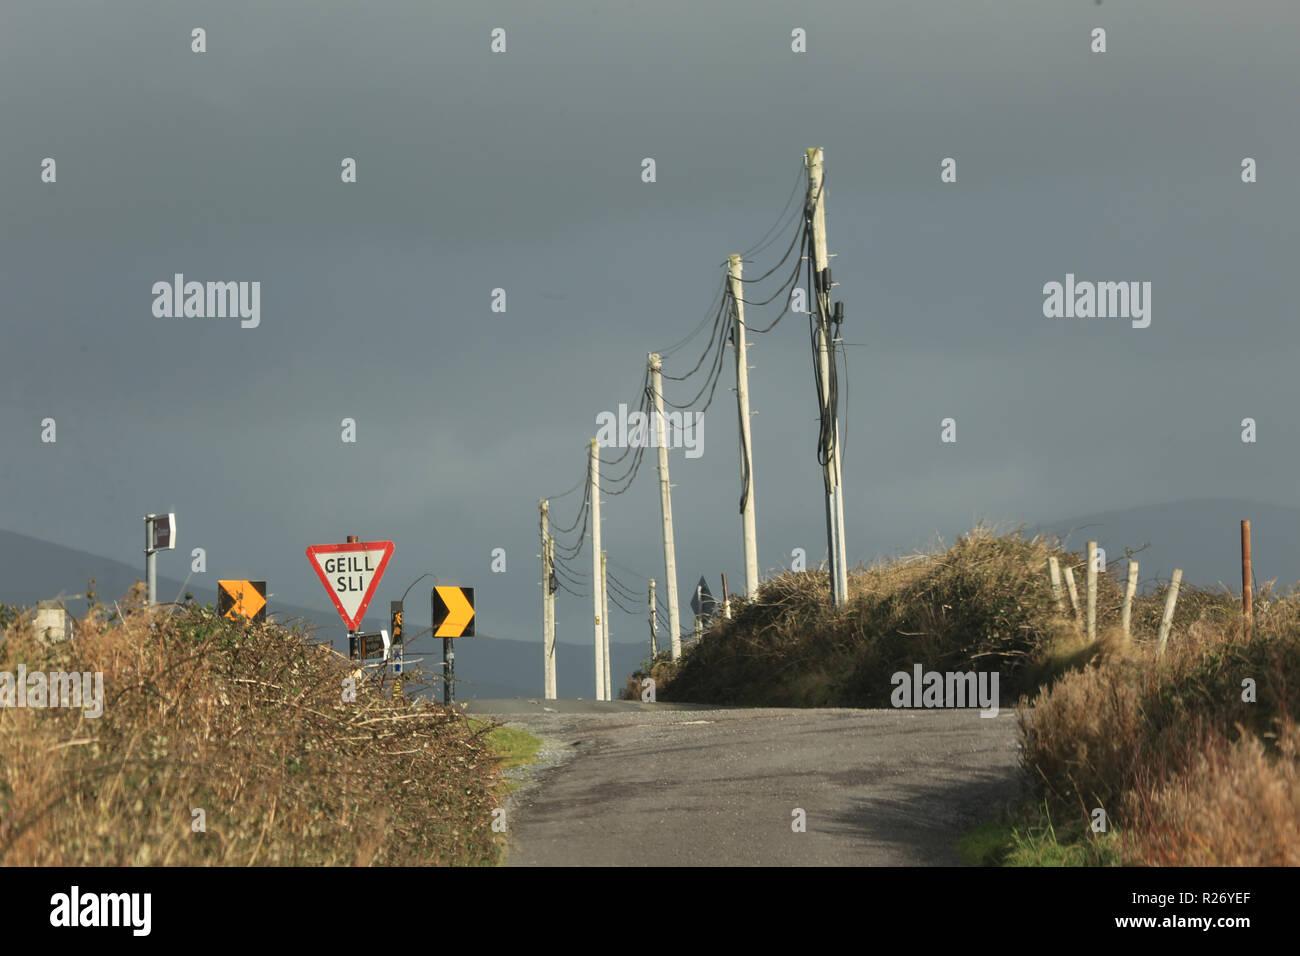 roadside scene with telegraph poles wild atlantic way, county kerry, ireland - Stock Image